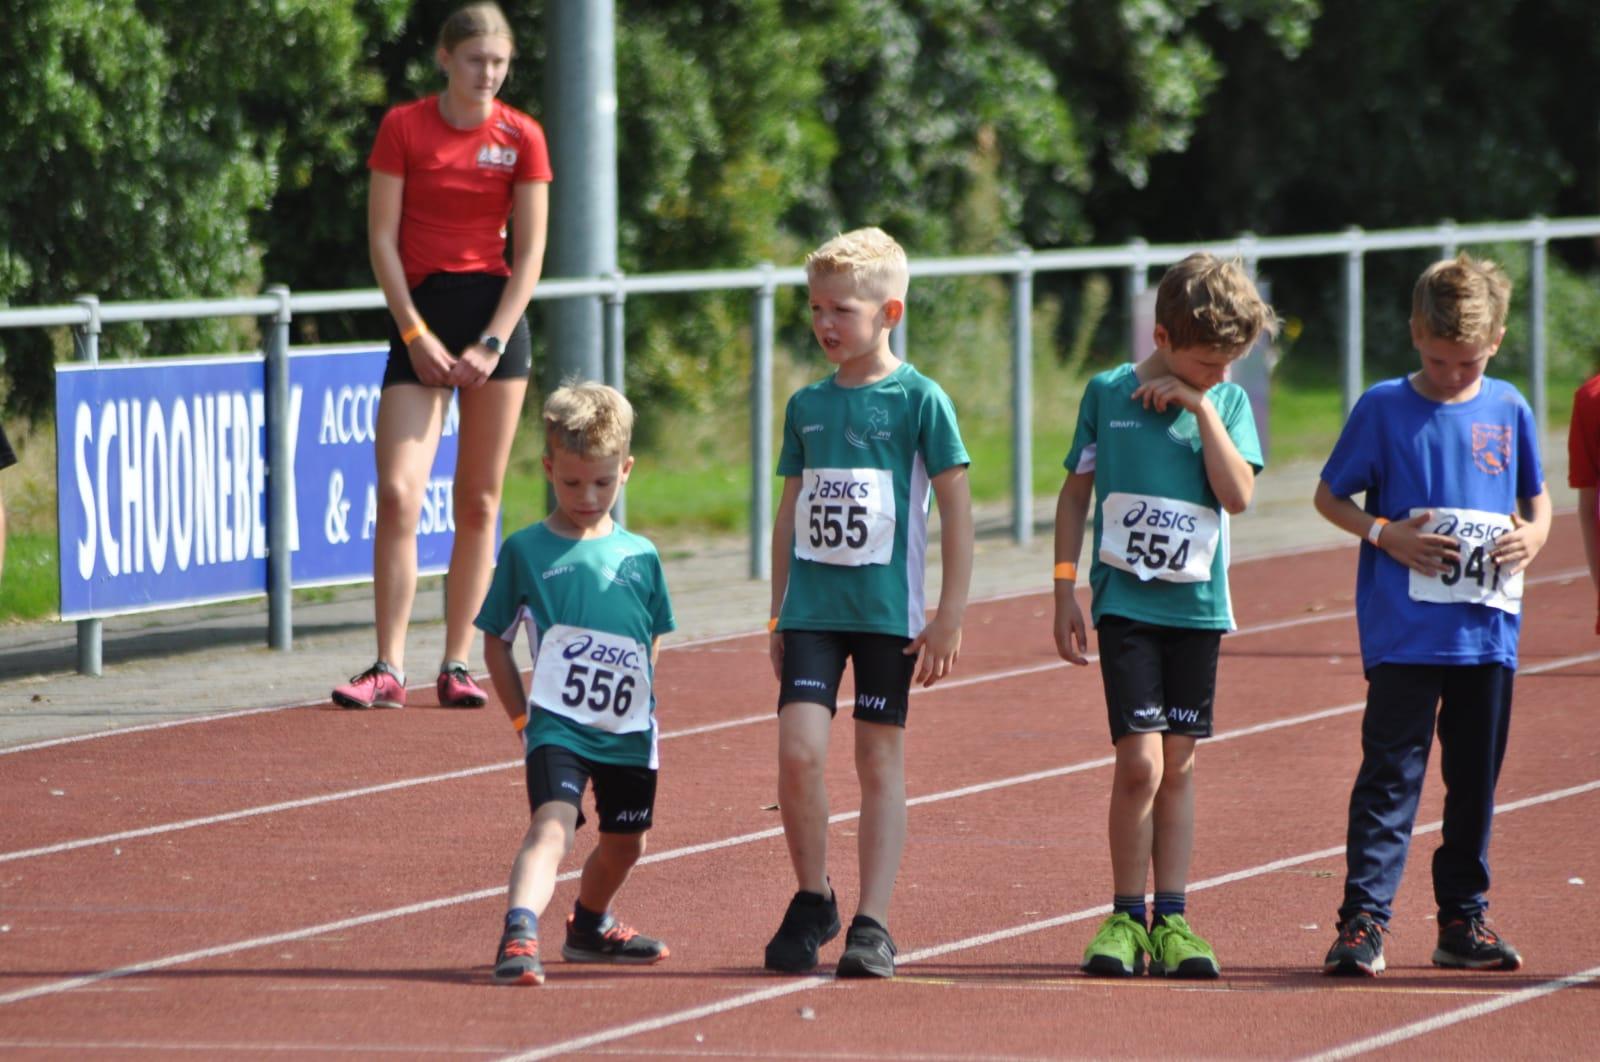 Wedstrijdverslag: 3e medaillewedstrijd te Almelo - 4 september 2021